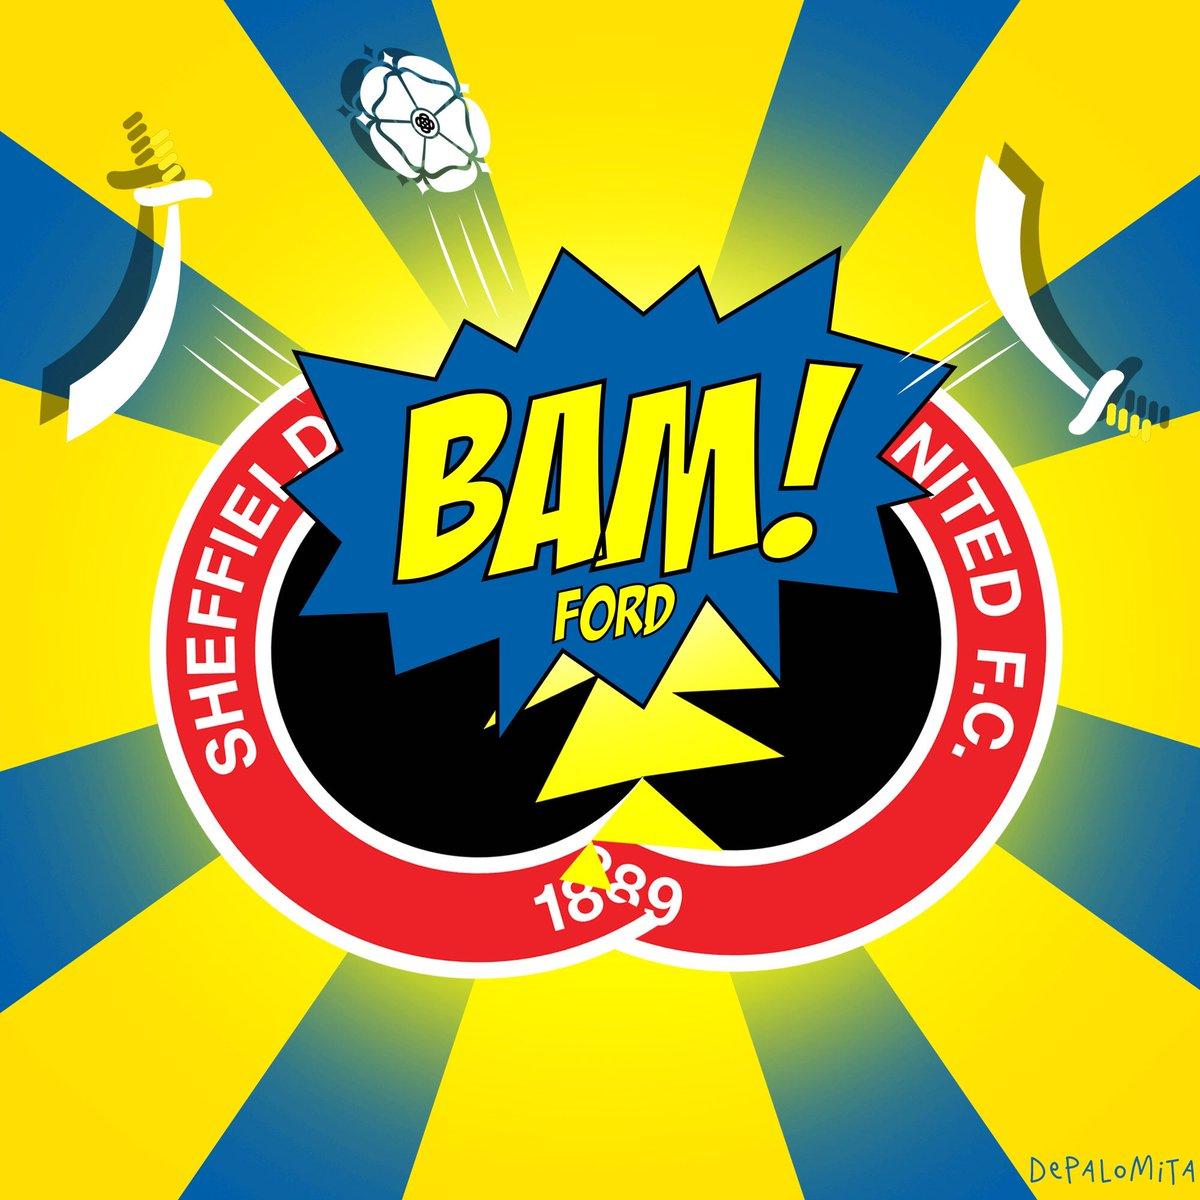 🔵🟡💣💥⚔️   #leeds #bamford #sheffield #premierleague #depalomita https://t.co/mUntsvJzj4